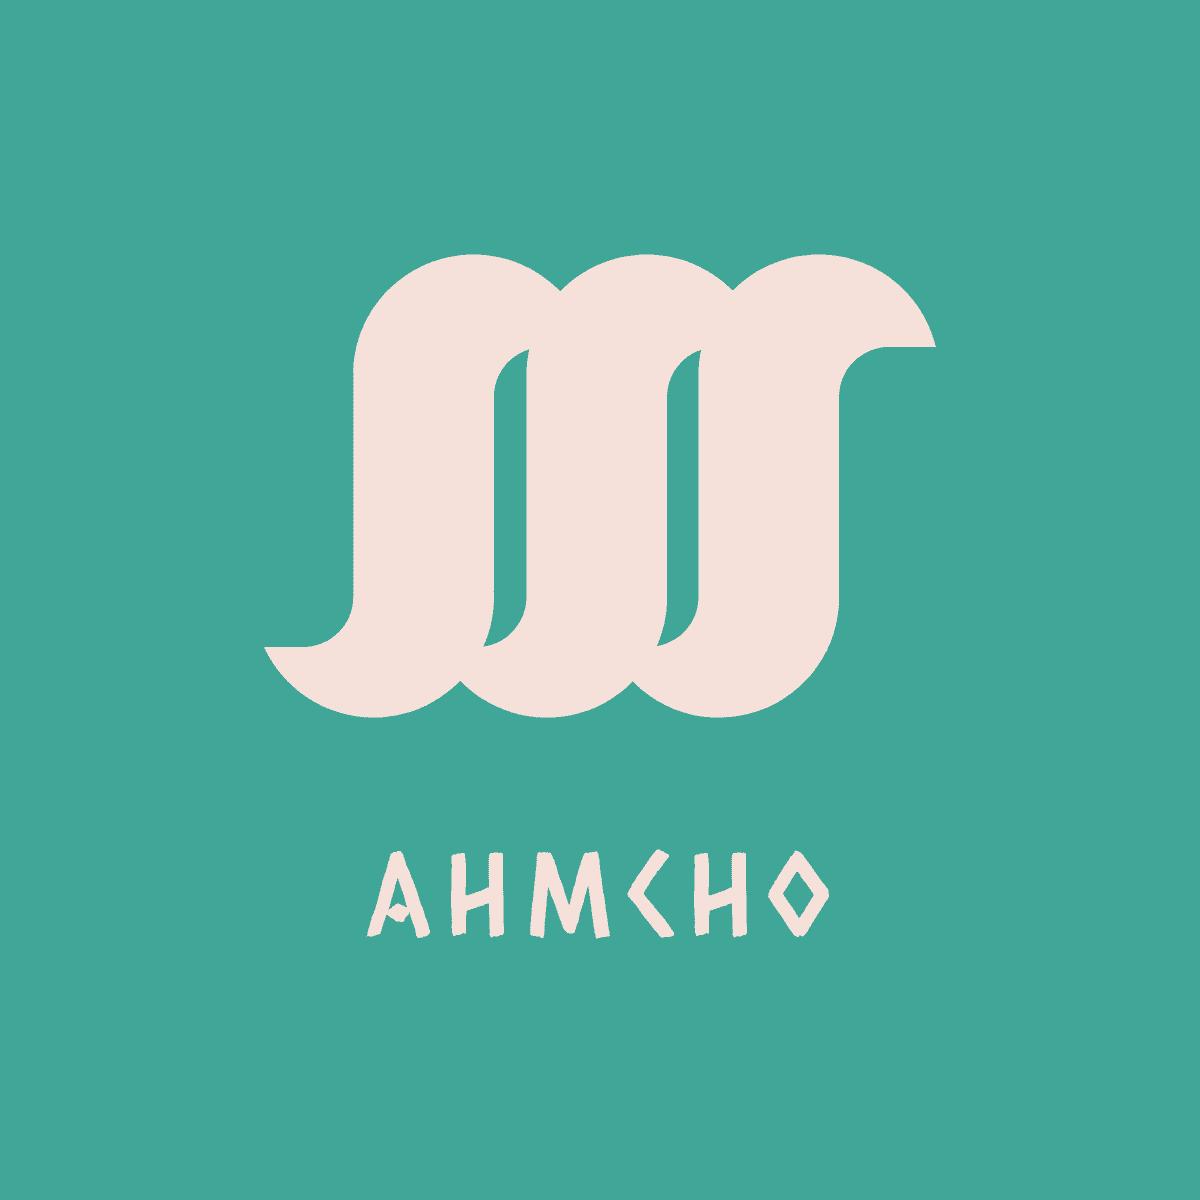 AhmCho website logo